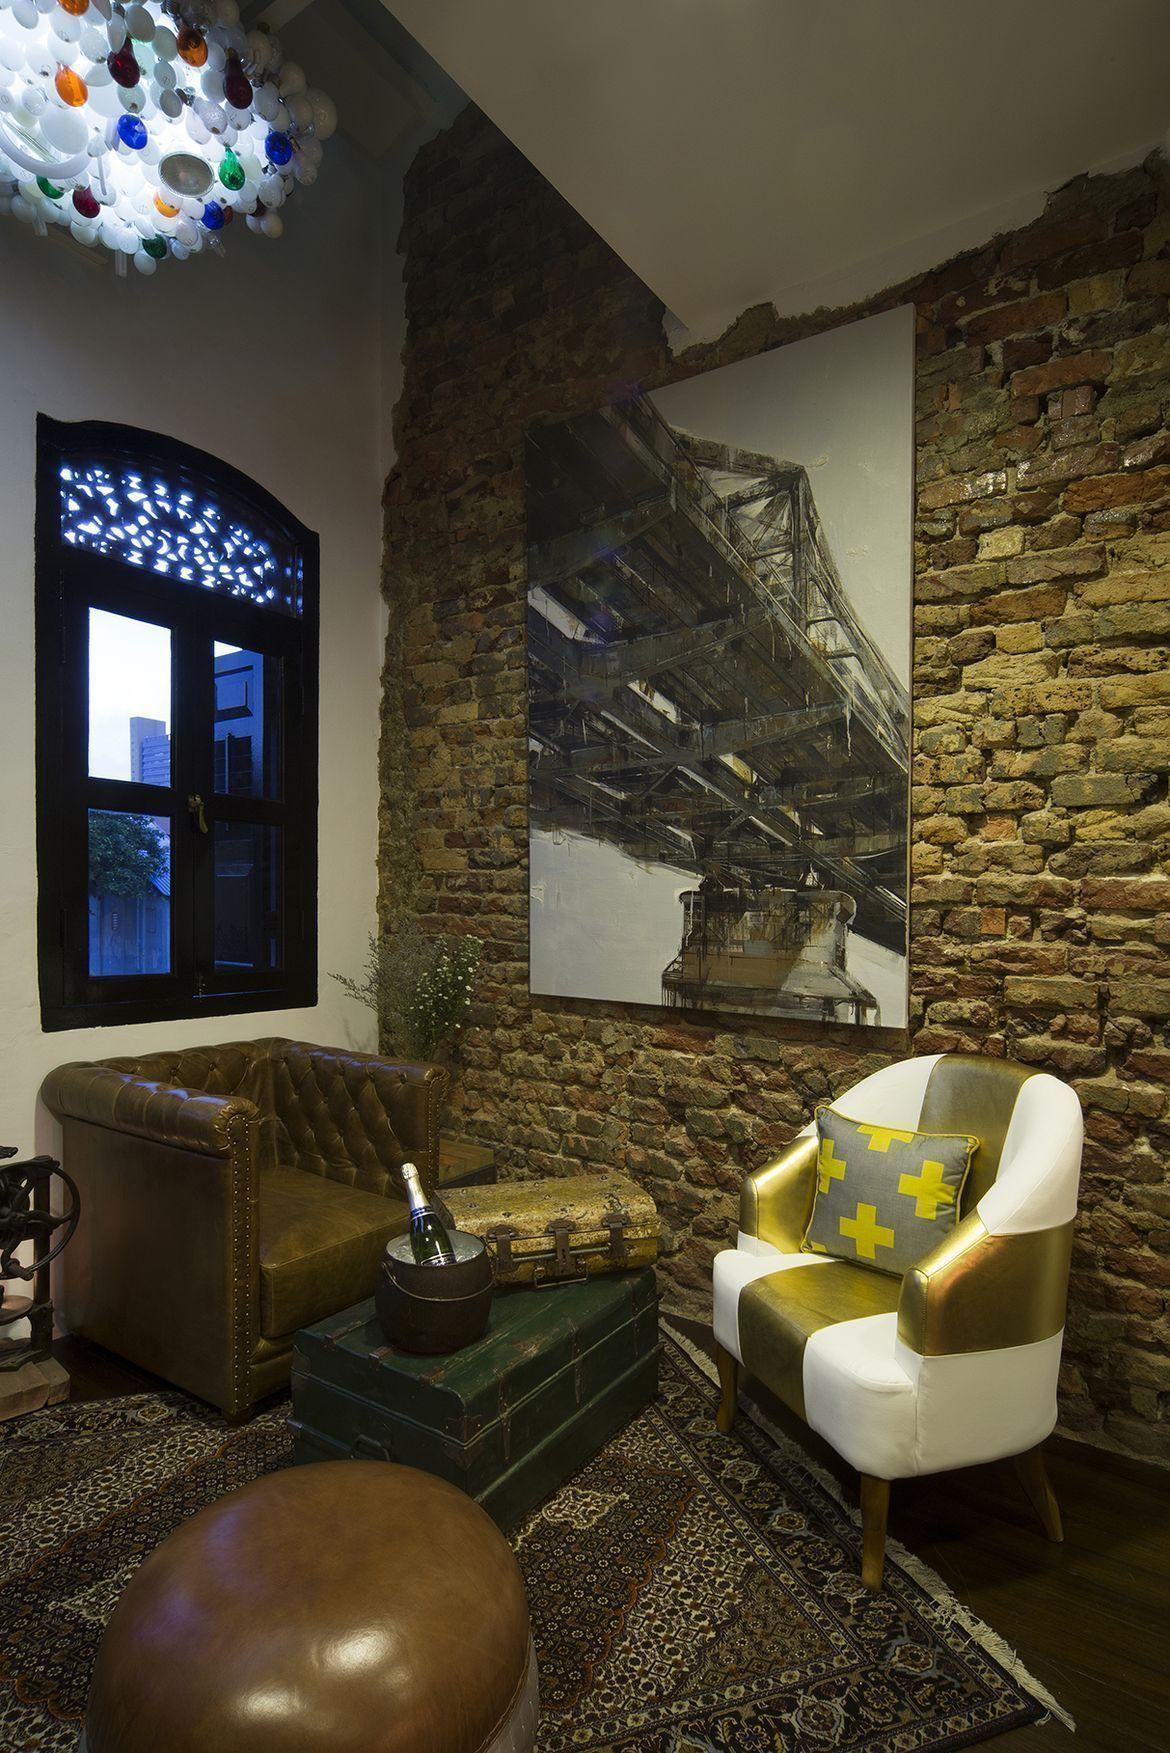 turkish interior design elements in cicheti italian restaurant